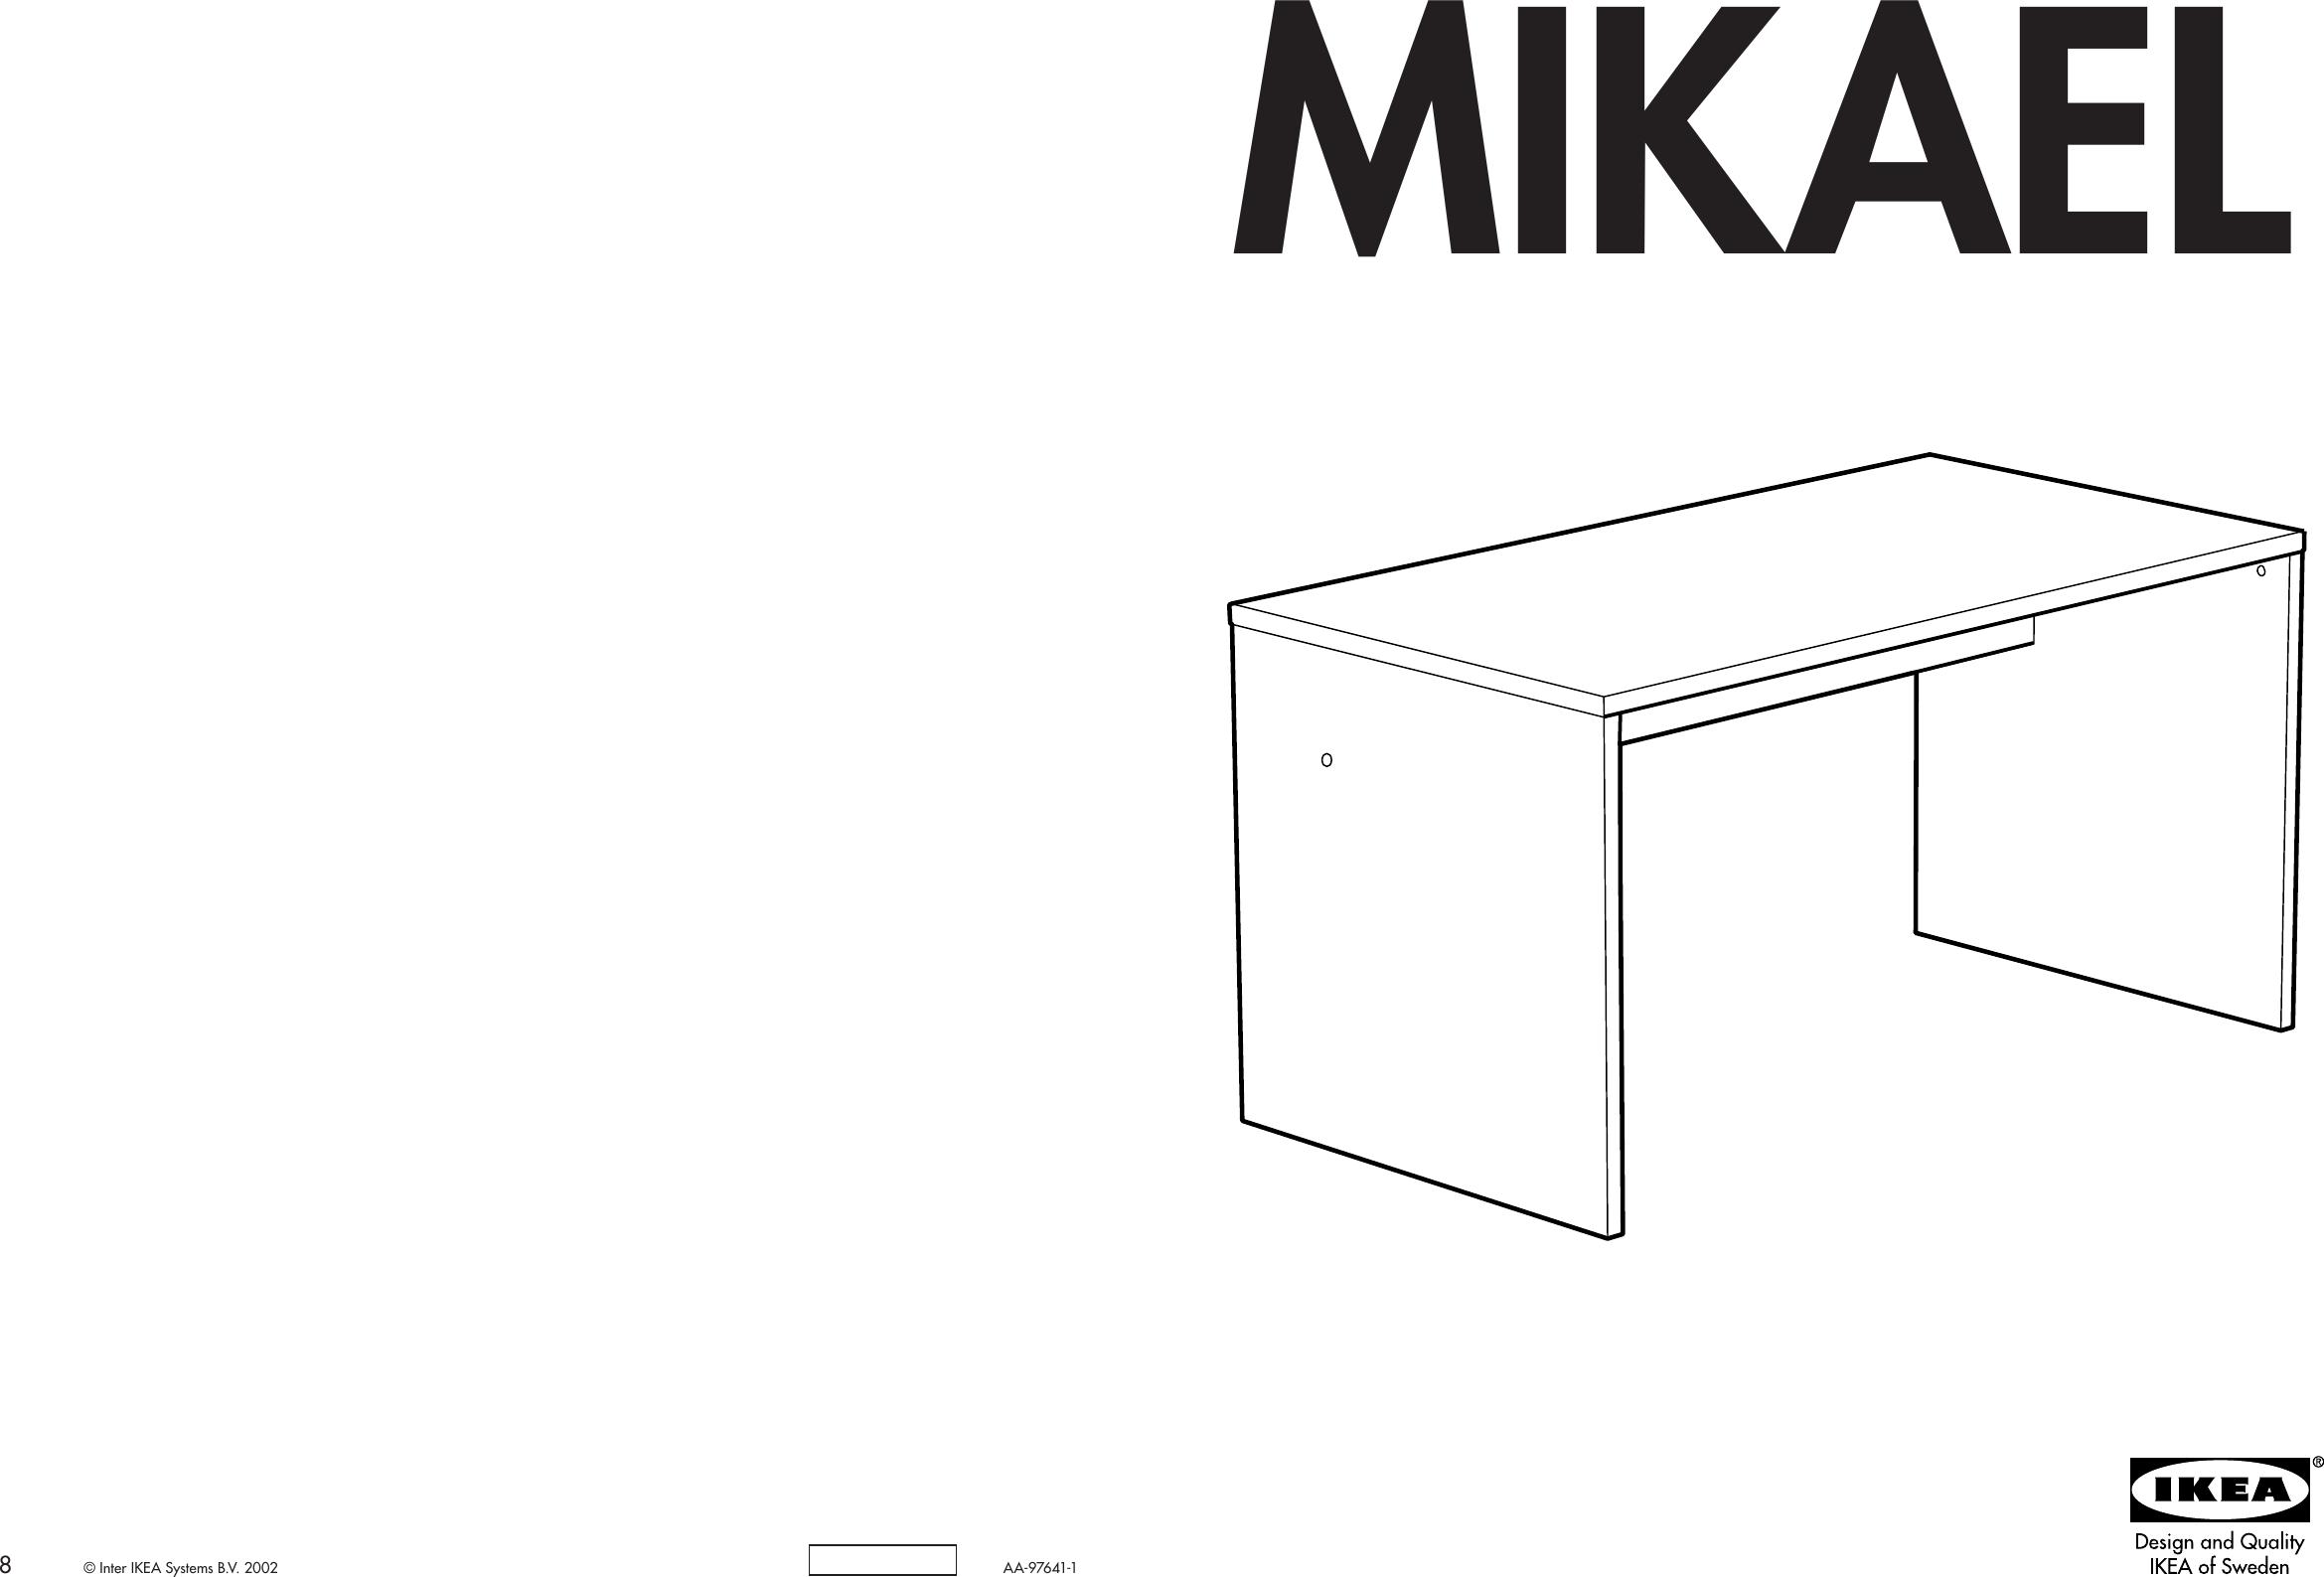 Ikea Mikael Desk 55x30 Assembly Instruction 2